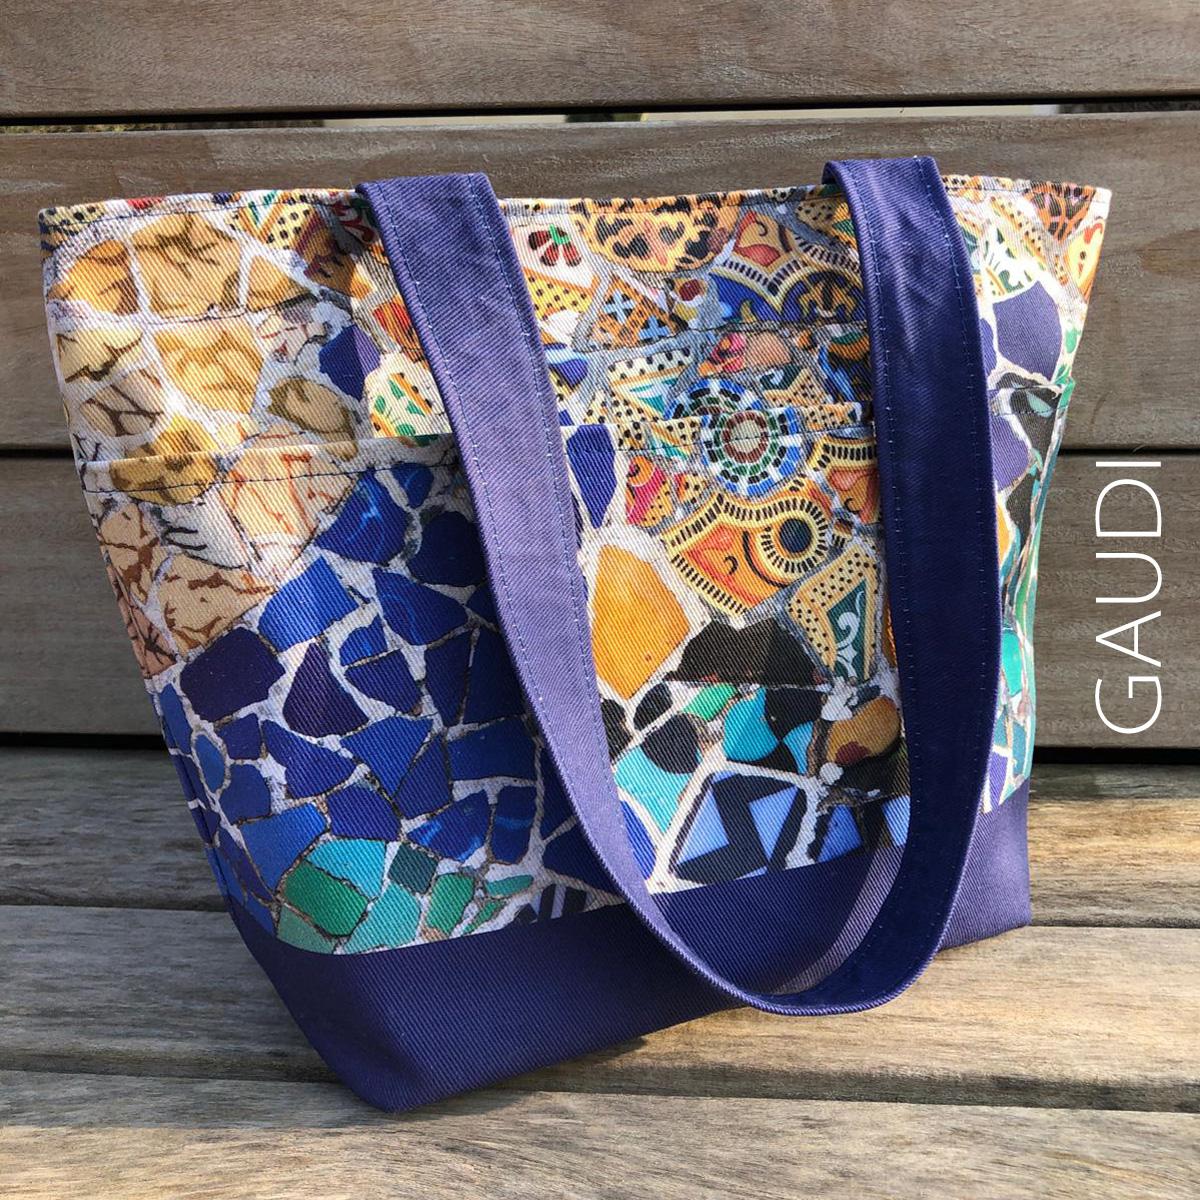 Gaudi modernist mosaic cut and sew tote bag